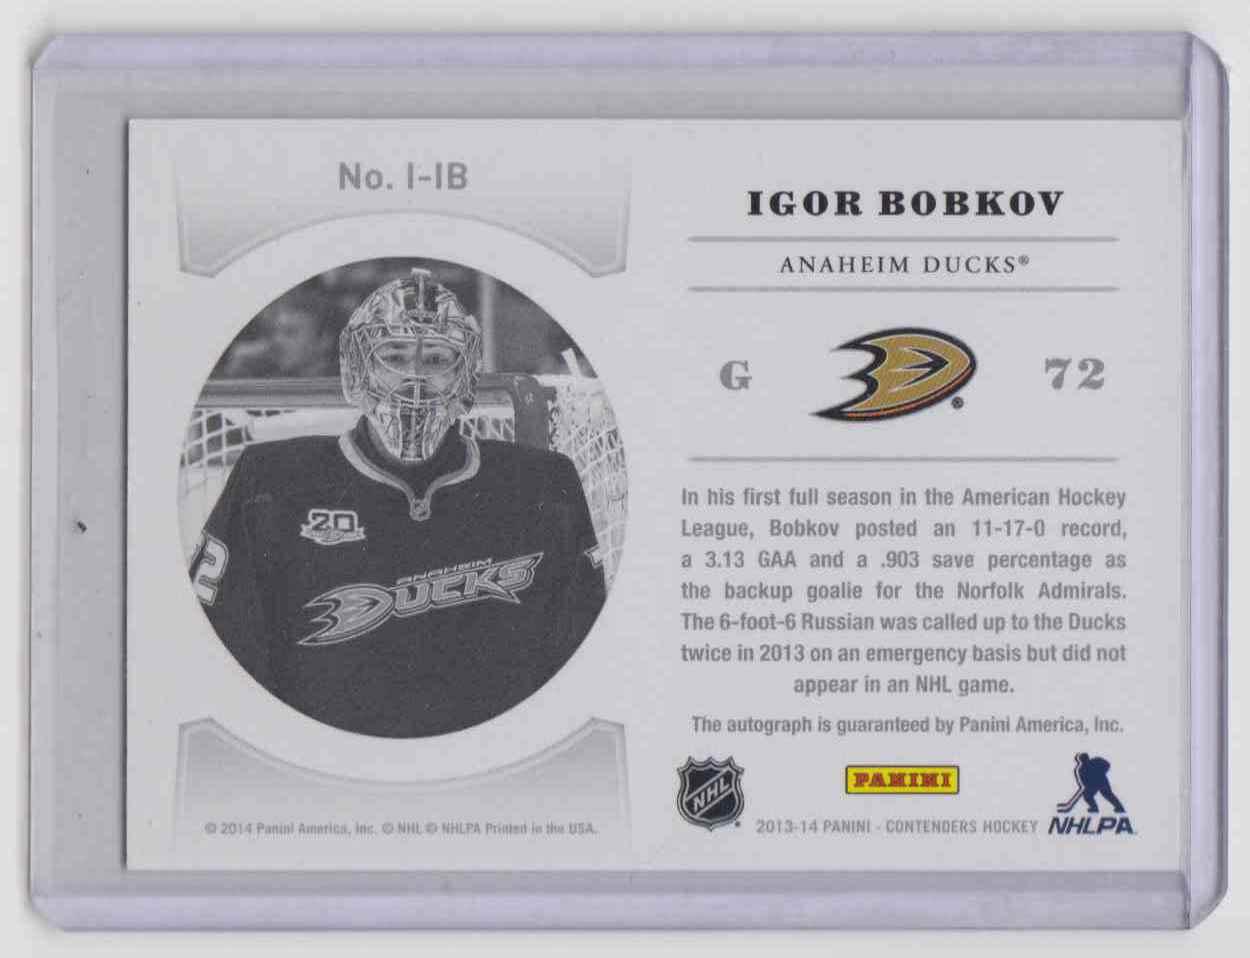 2013-14 Panini Contenders NHL Ink Igor Bobkov #I-IB card back image